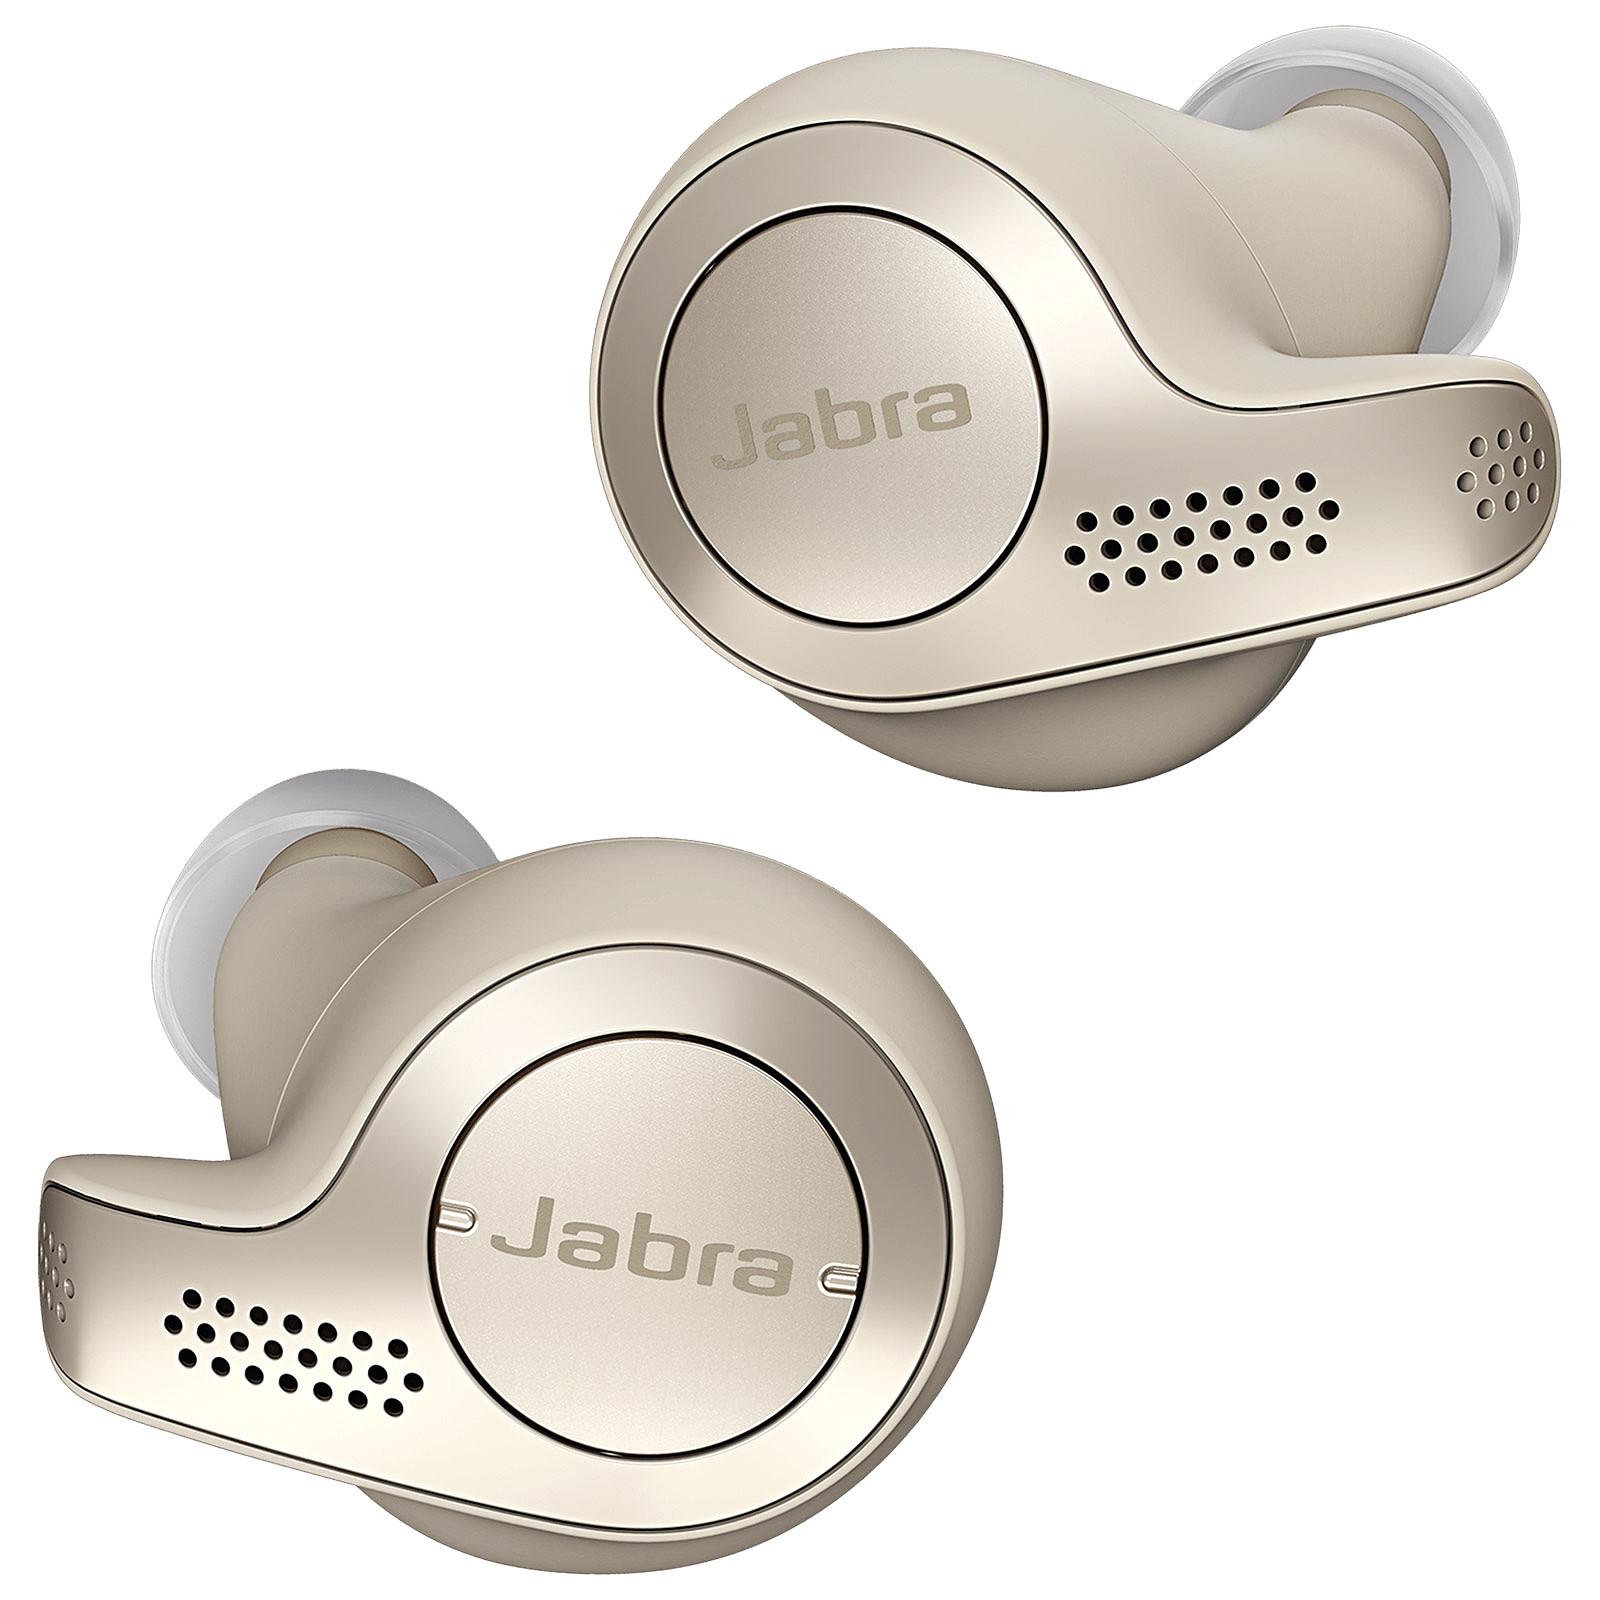 Jabra Elite 65t Or/Beige